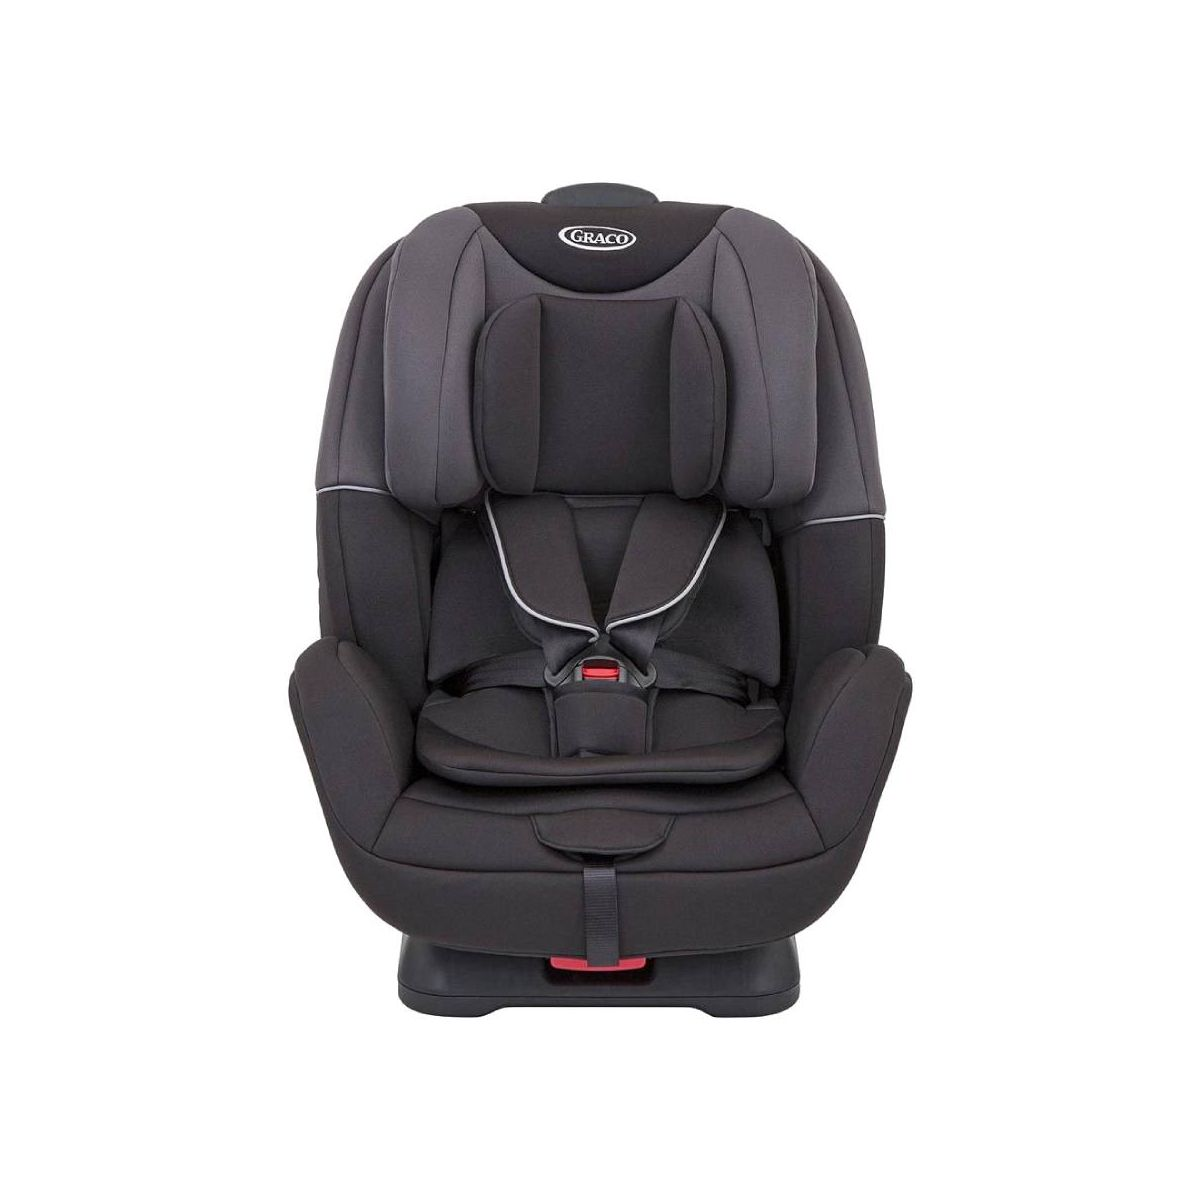 Graco Enhance Car Seat